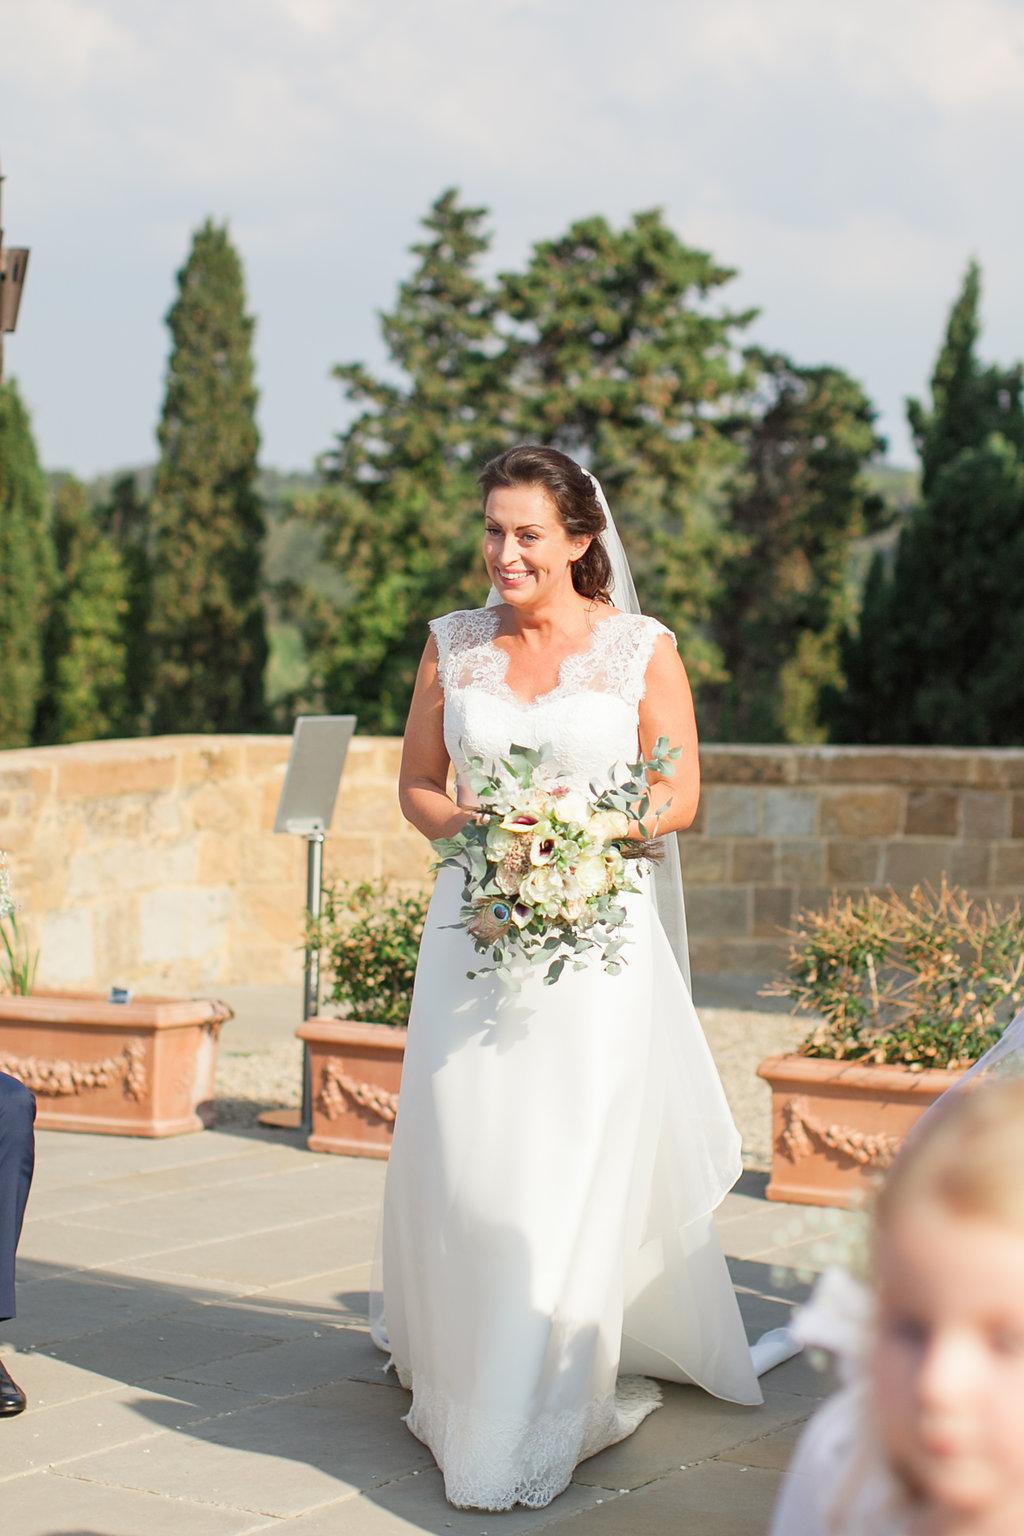 castelfalfi-tuscany-wedding-photographer-roberta-facchini-151